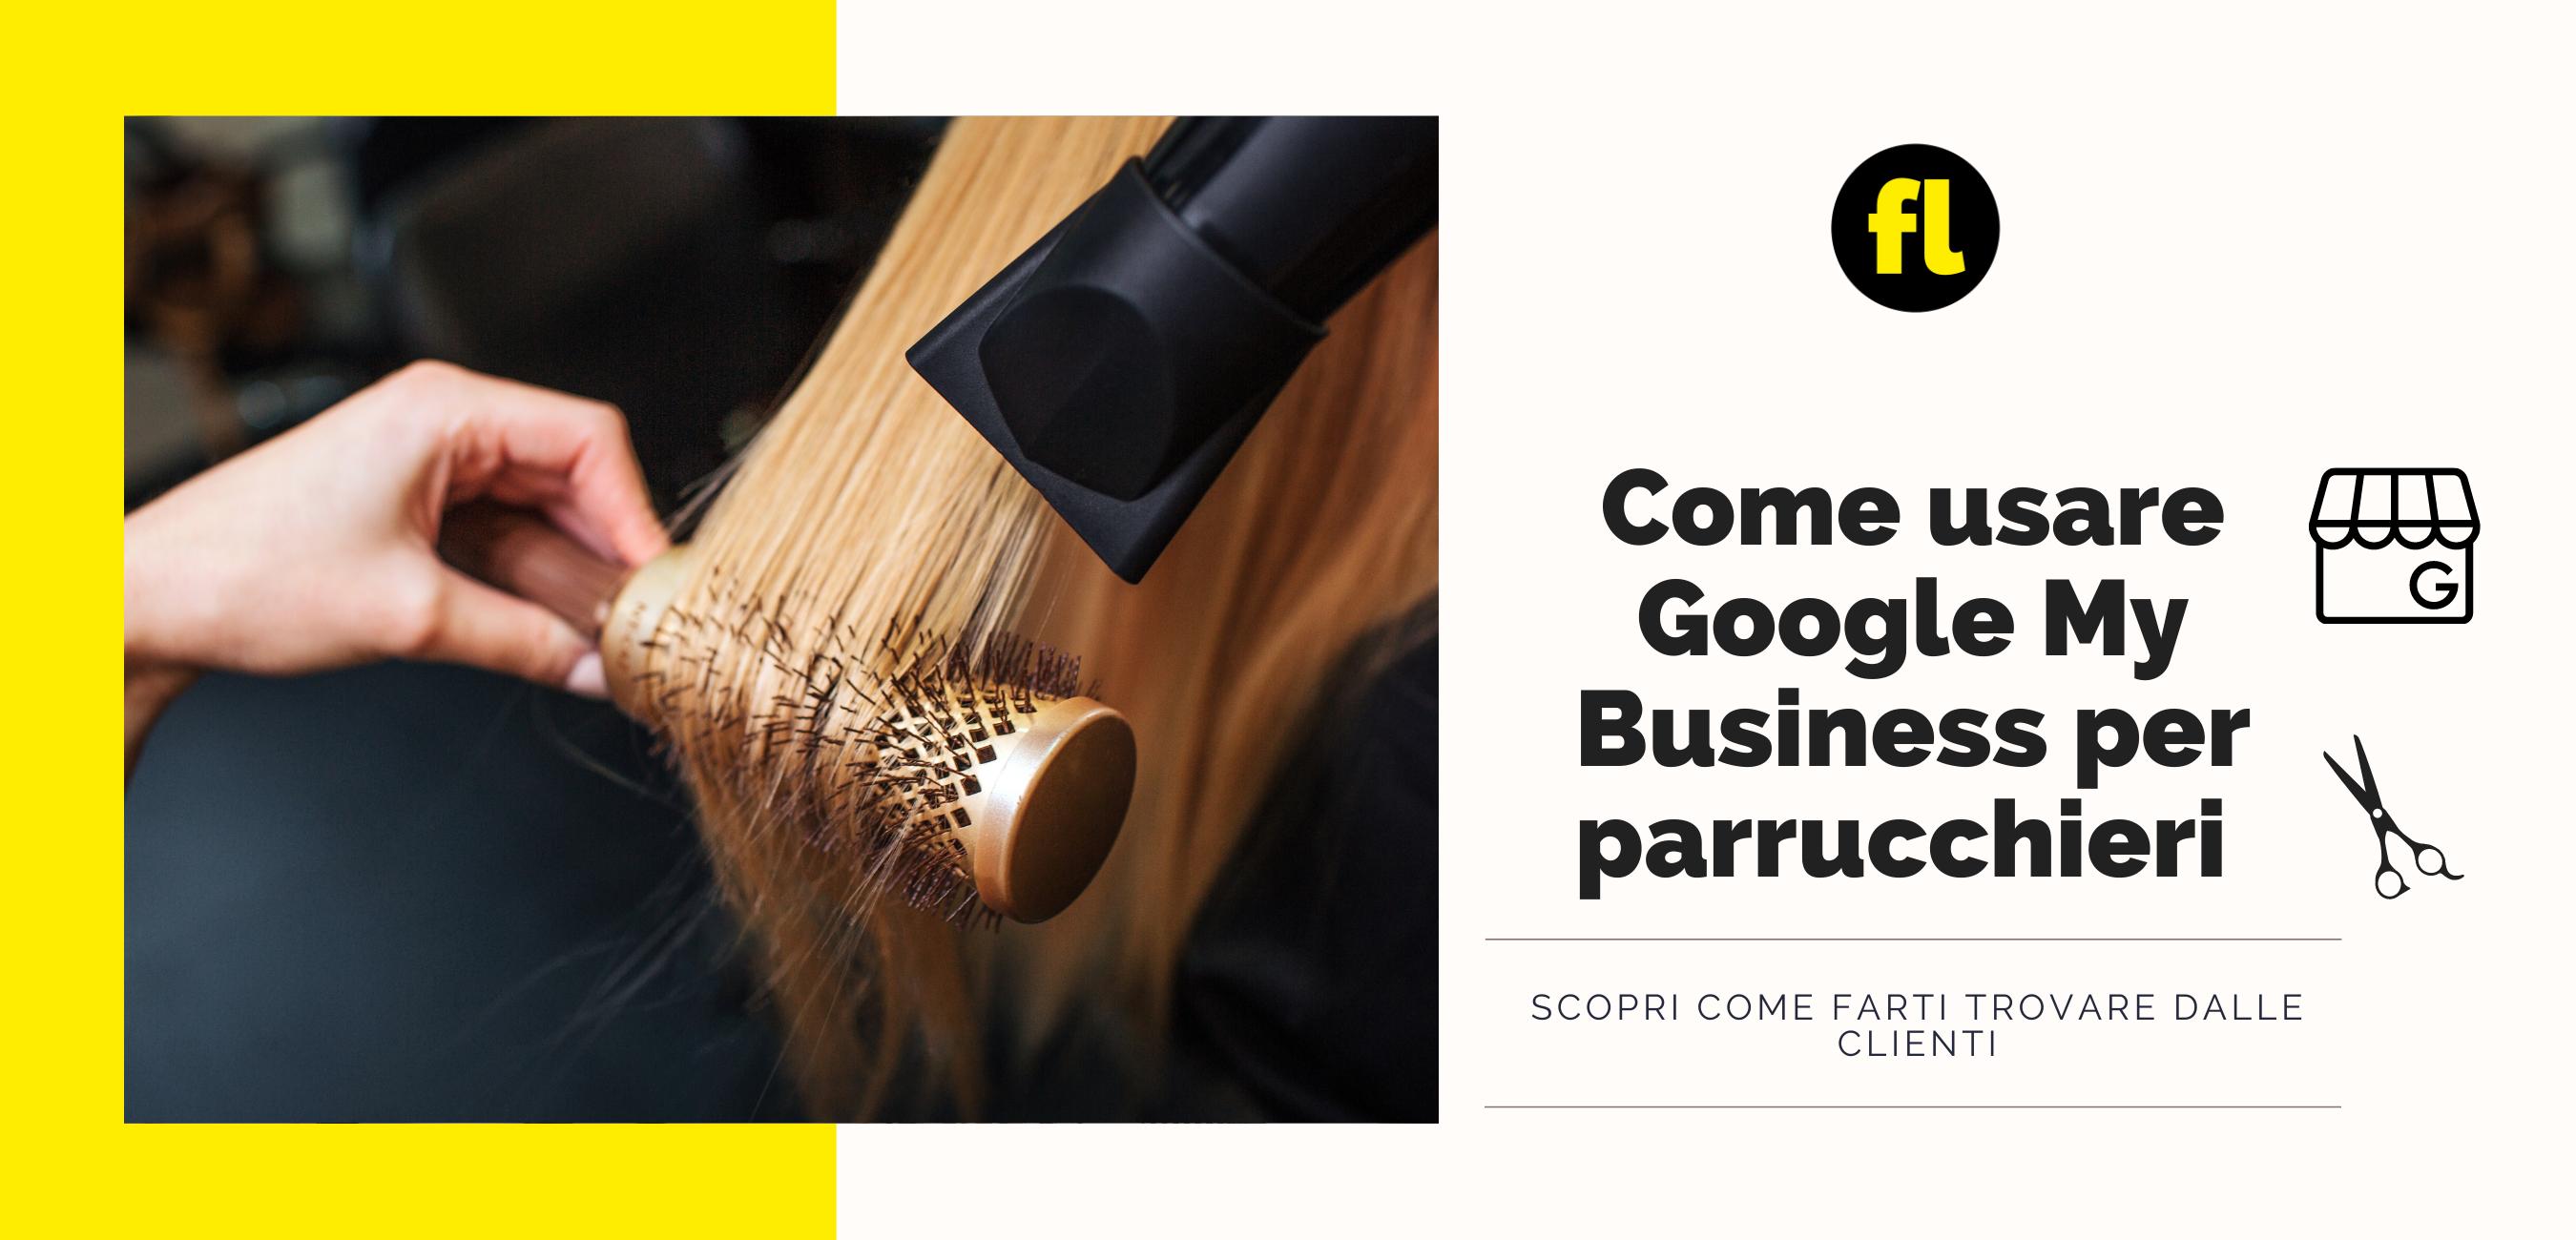 Come usare Google My Business per parrucchieri